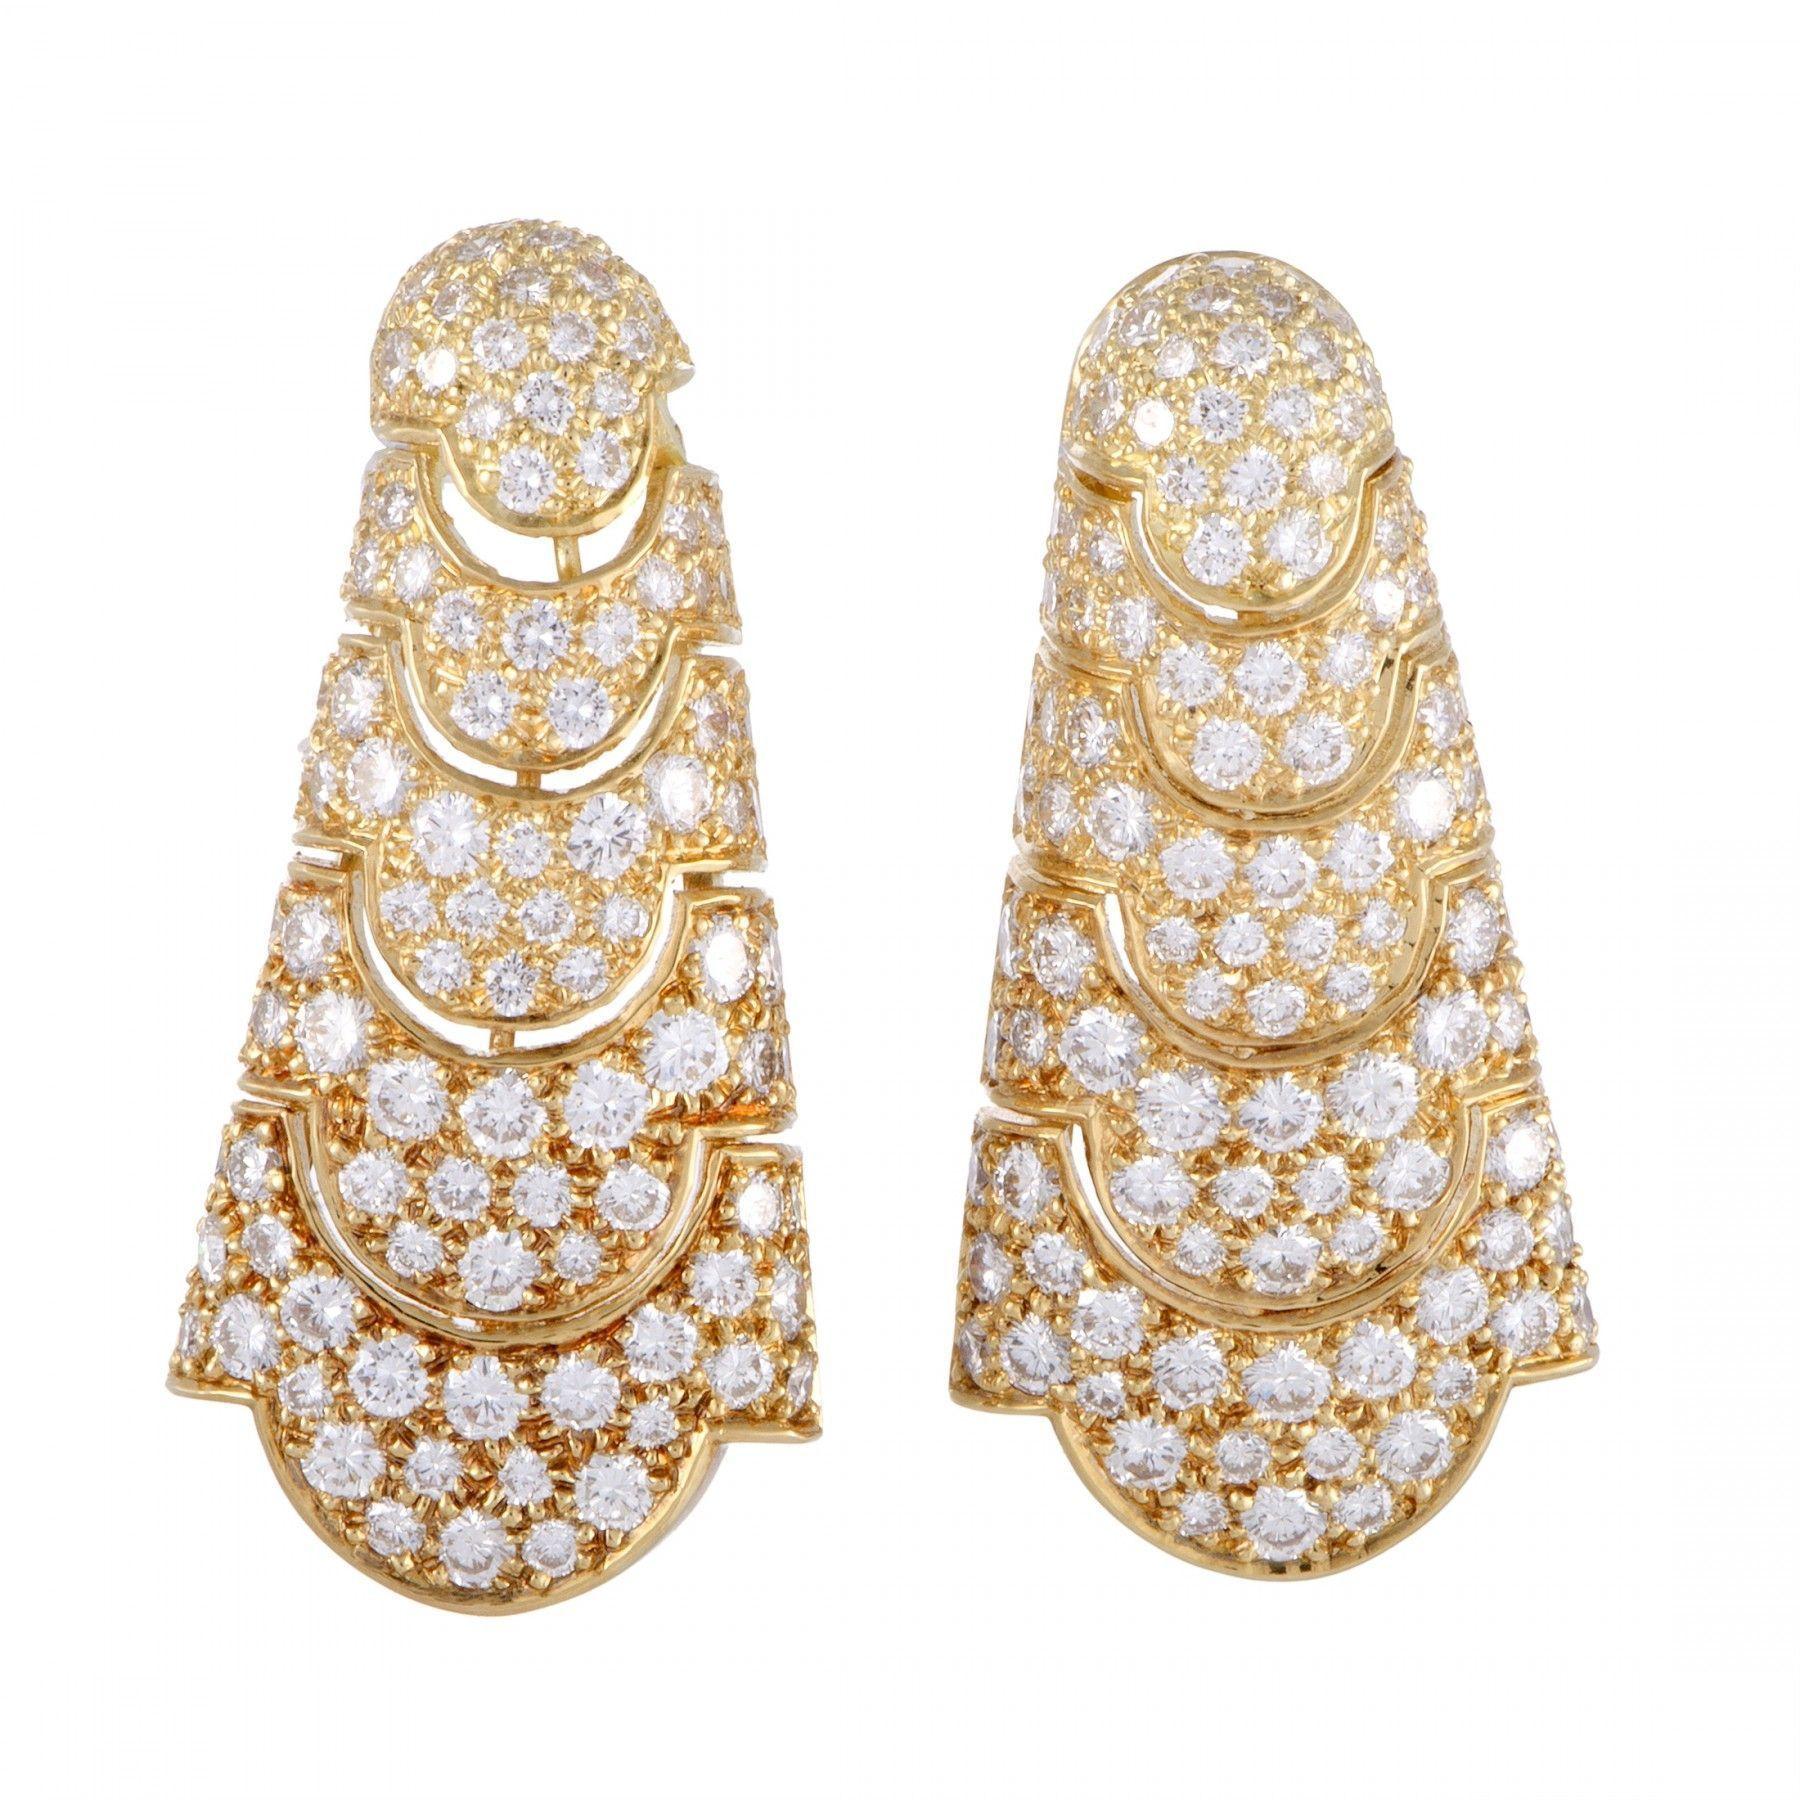 Cartier Vintage 18k Yellow Gold Full Diamond Pave Drop Earrings